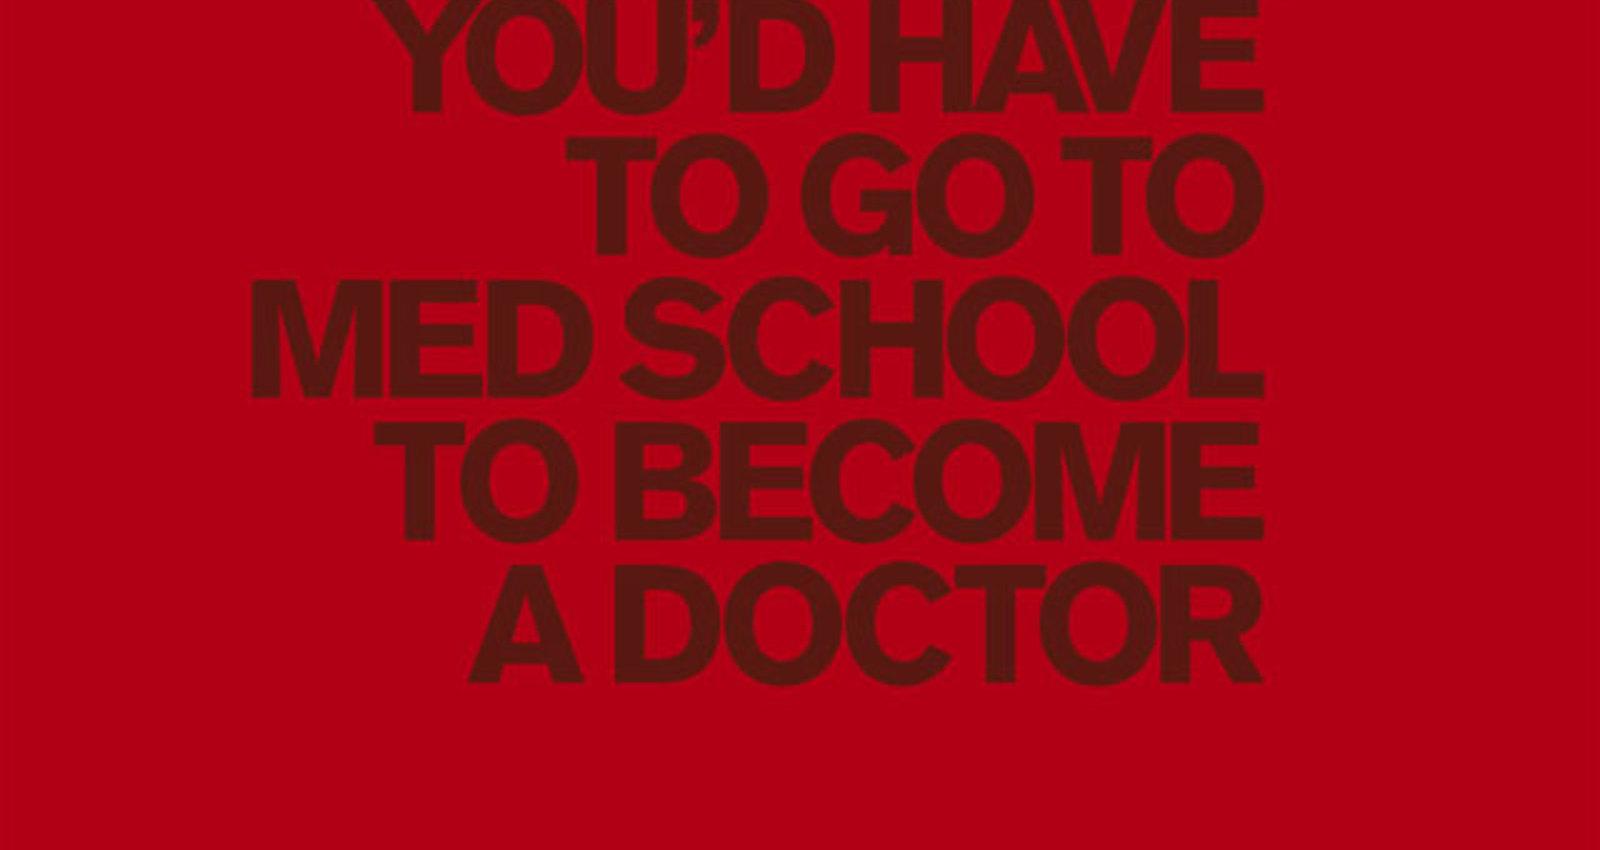 Doctor, What Season, Politics, D.C. United, Yogi Berra